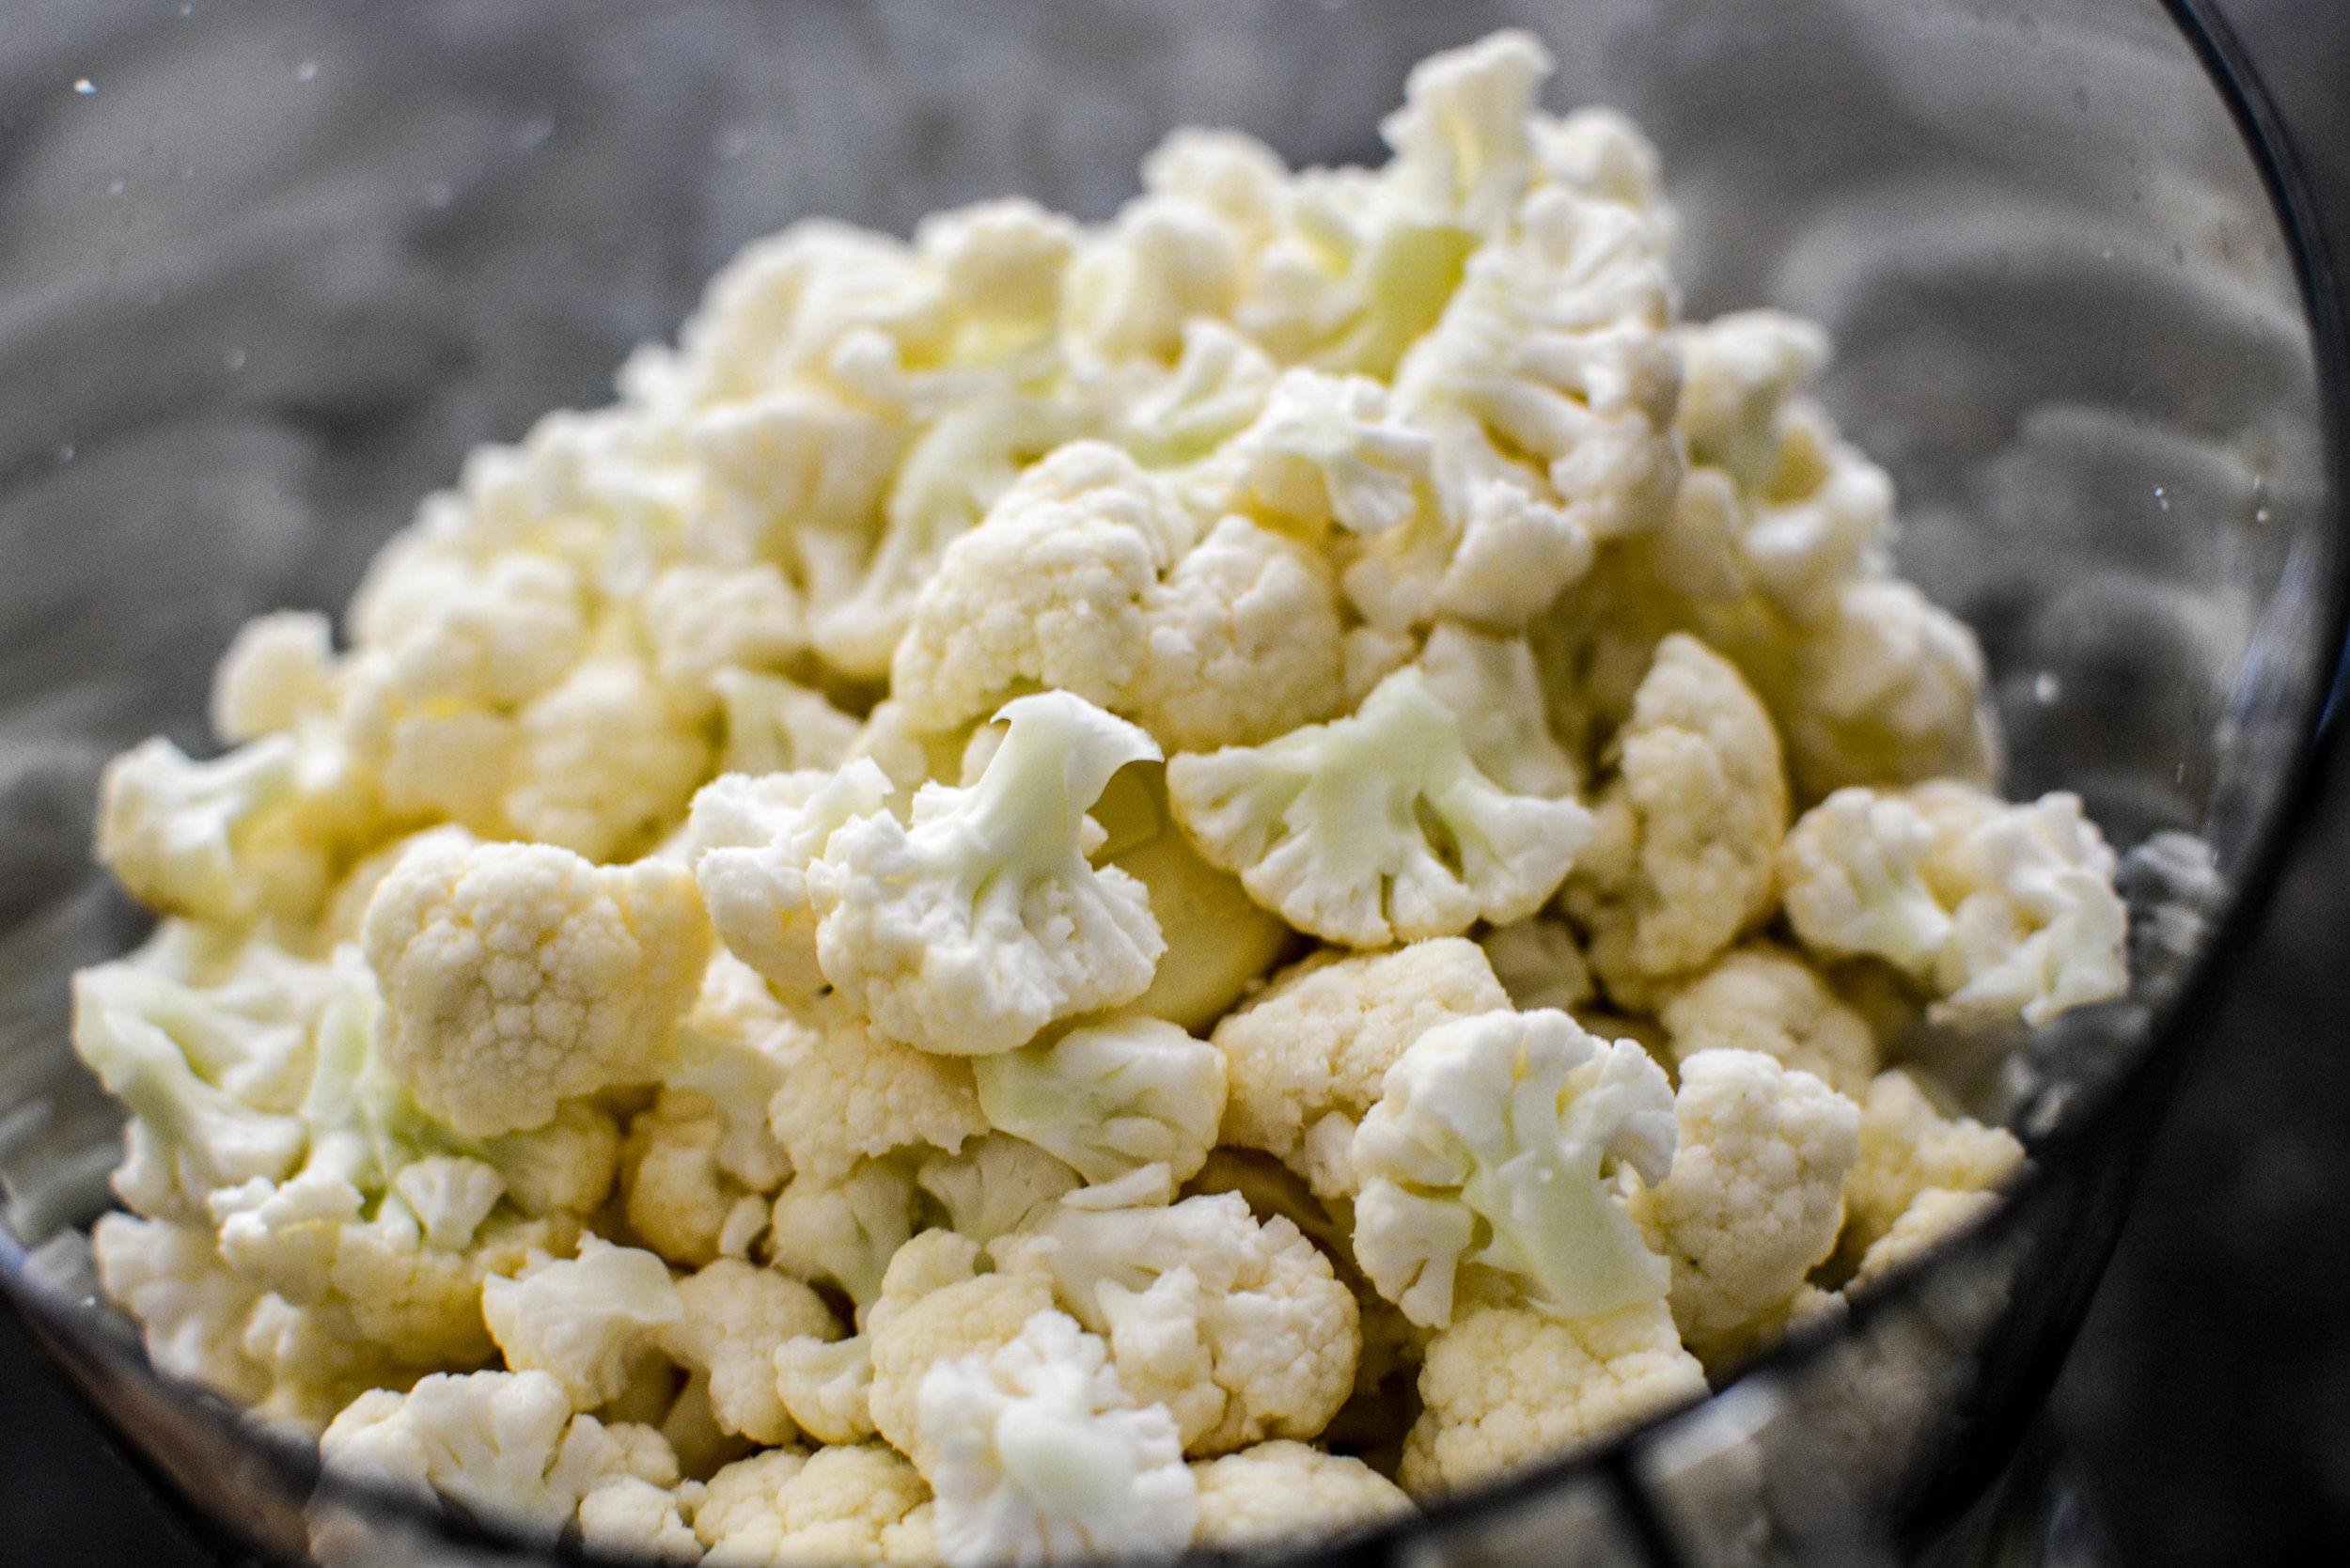 ready to process cauliflower rice